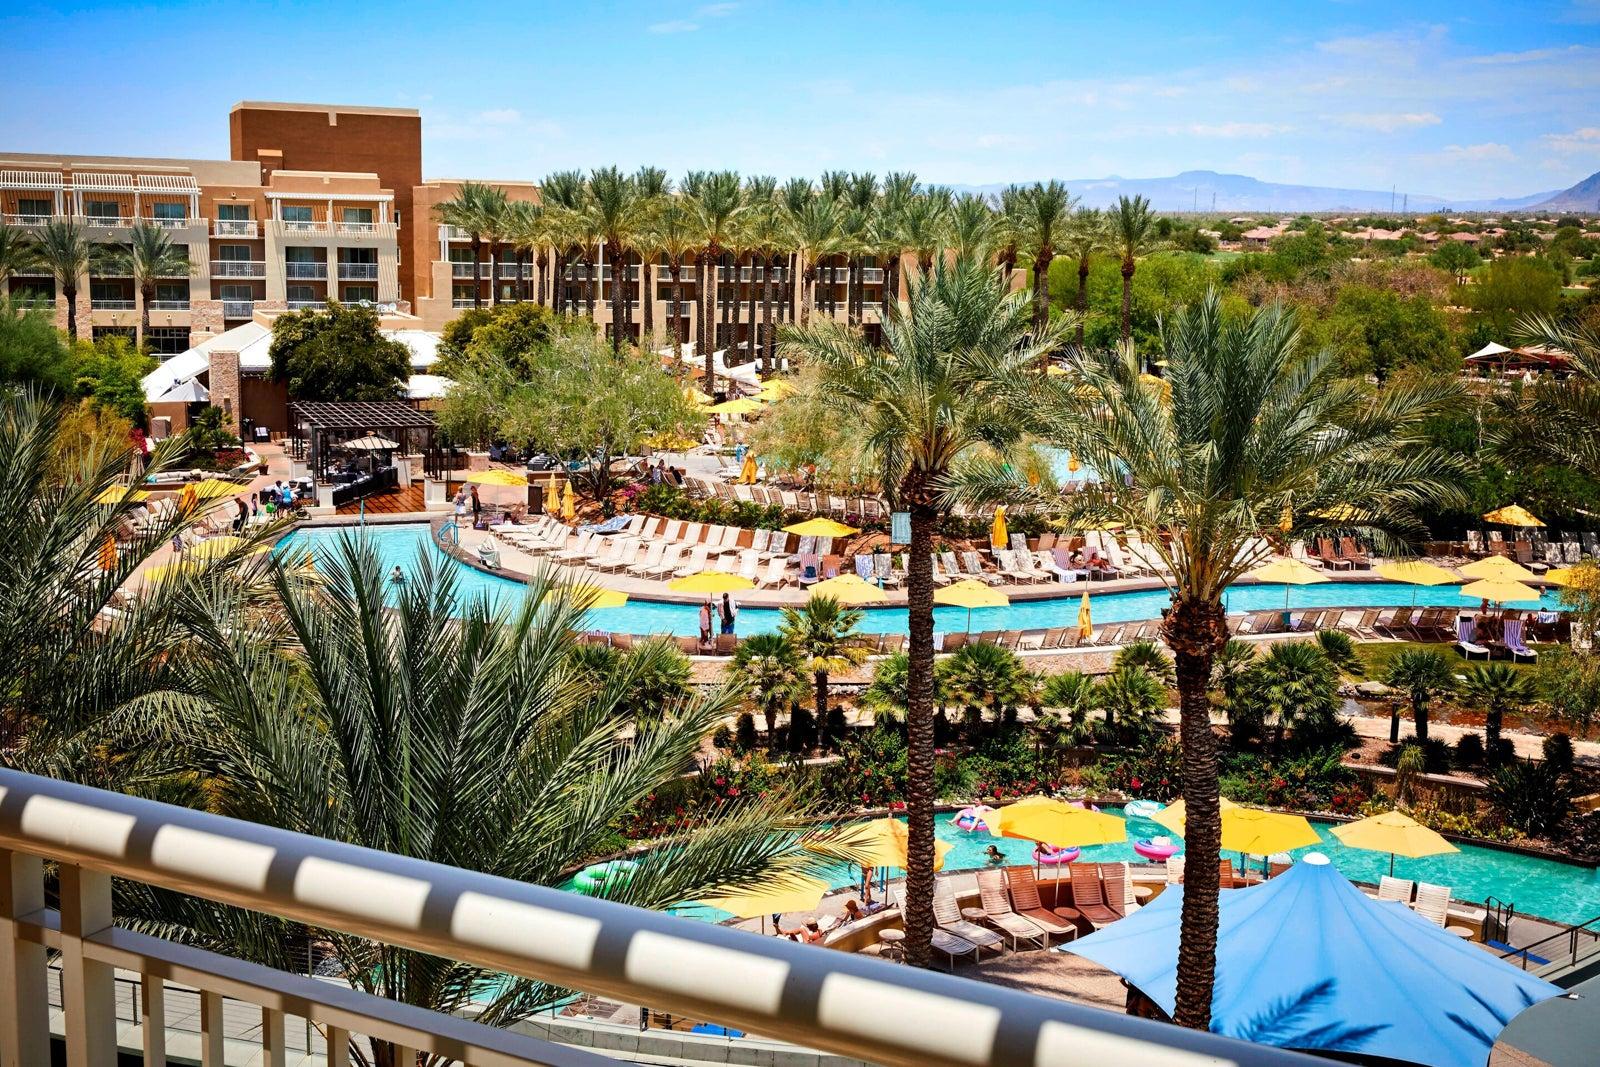 The JW Marriott Phoenix Desert Ridge Resort & Spa. (Photo courtesy of Marriott)